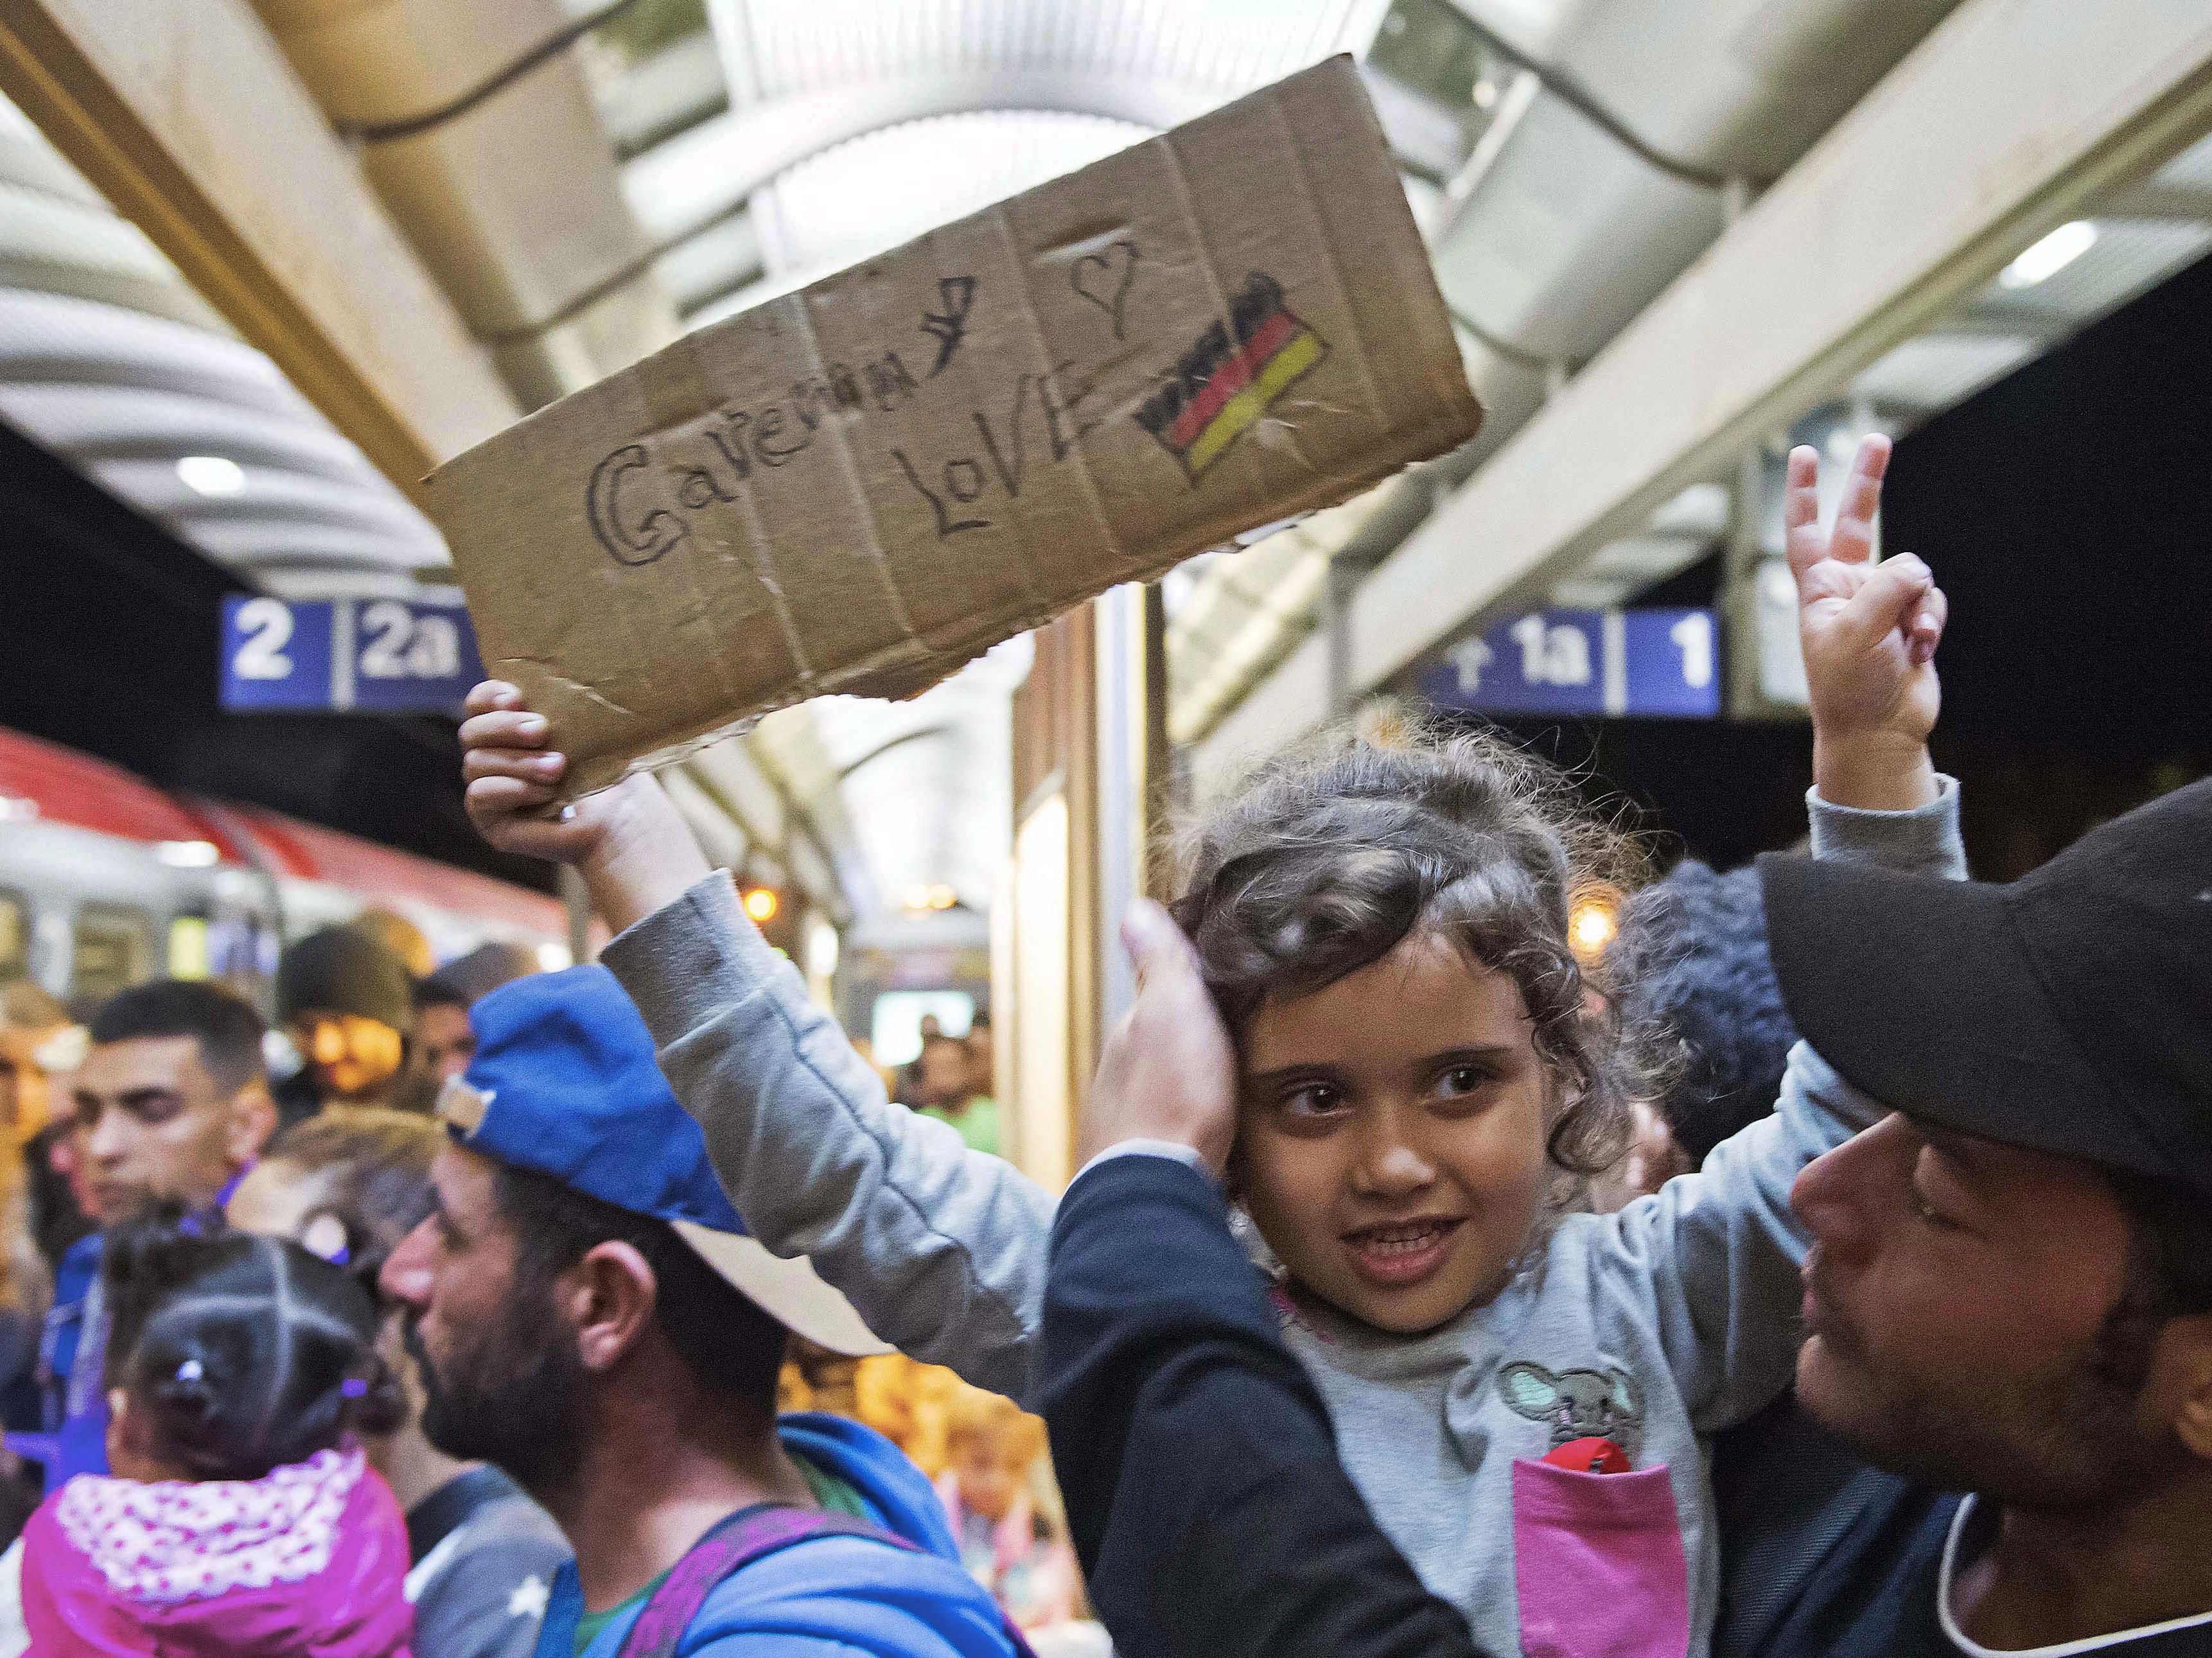 Trainloads Of Migrants Begin Arriving In Germany